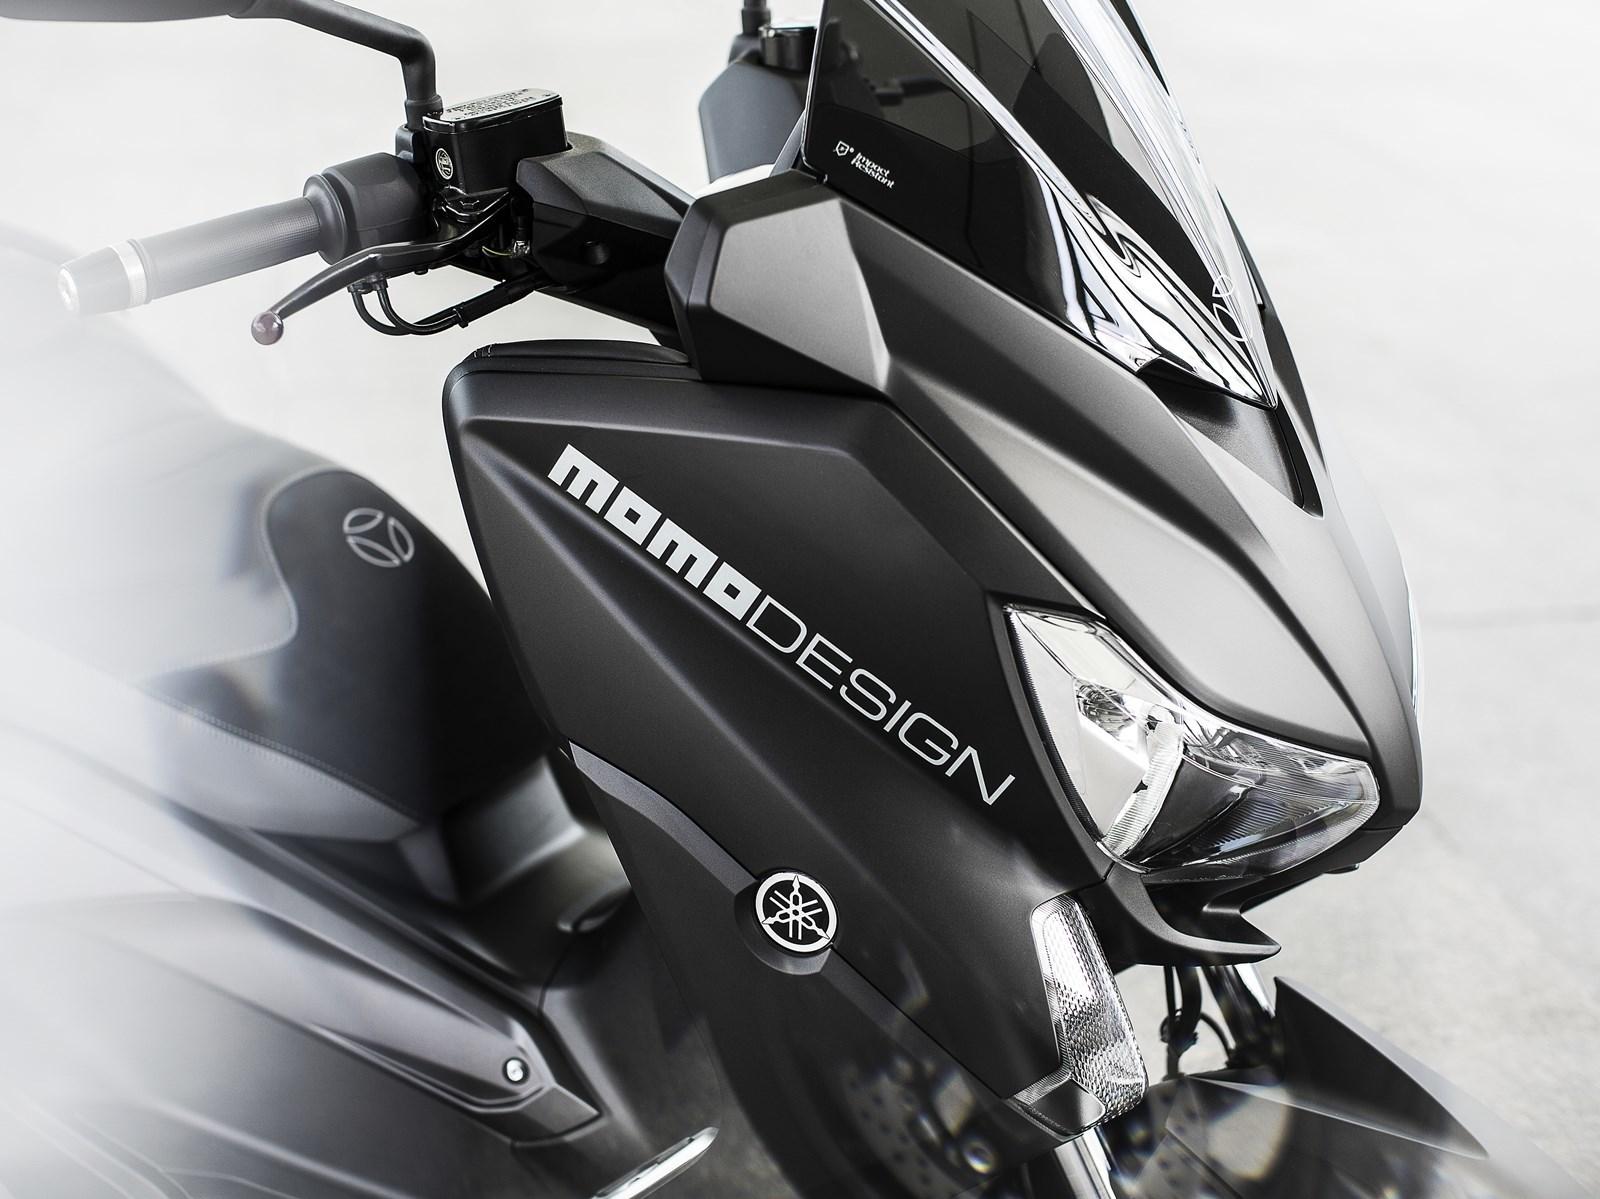 Foto de Yamaha X-MAX 400 MOMODESIGN, estudio y detalles (33/33)